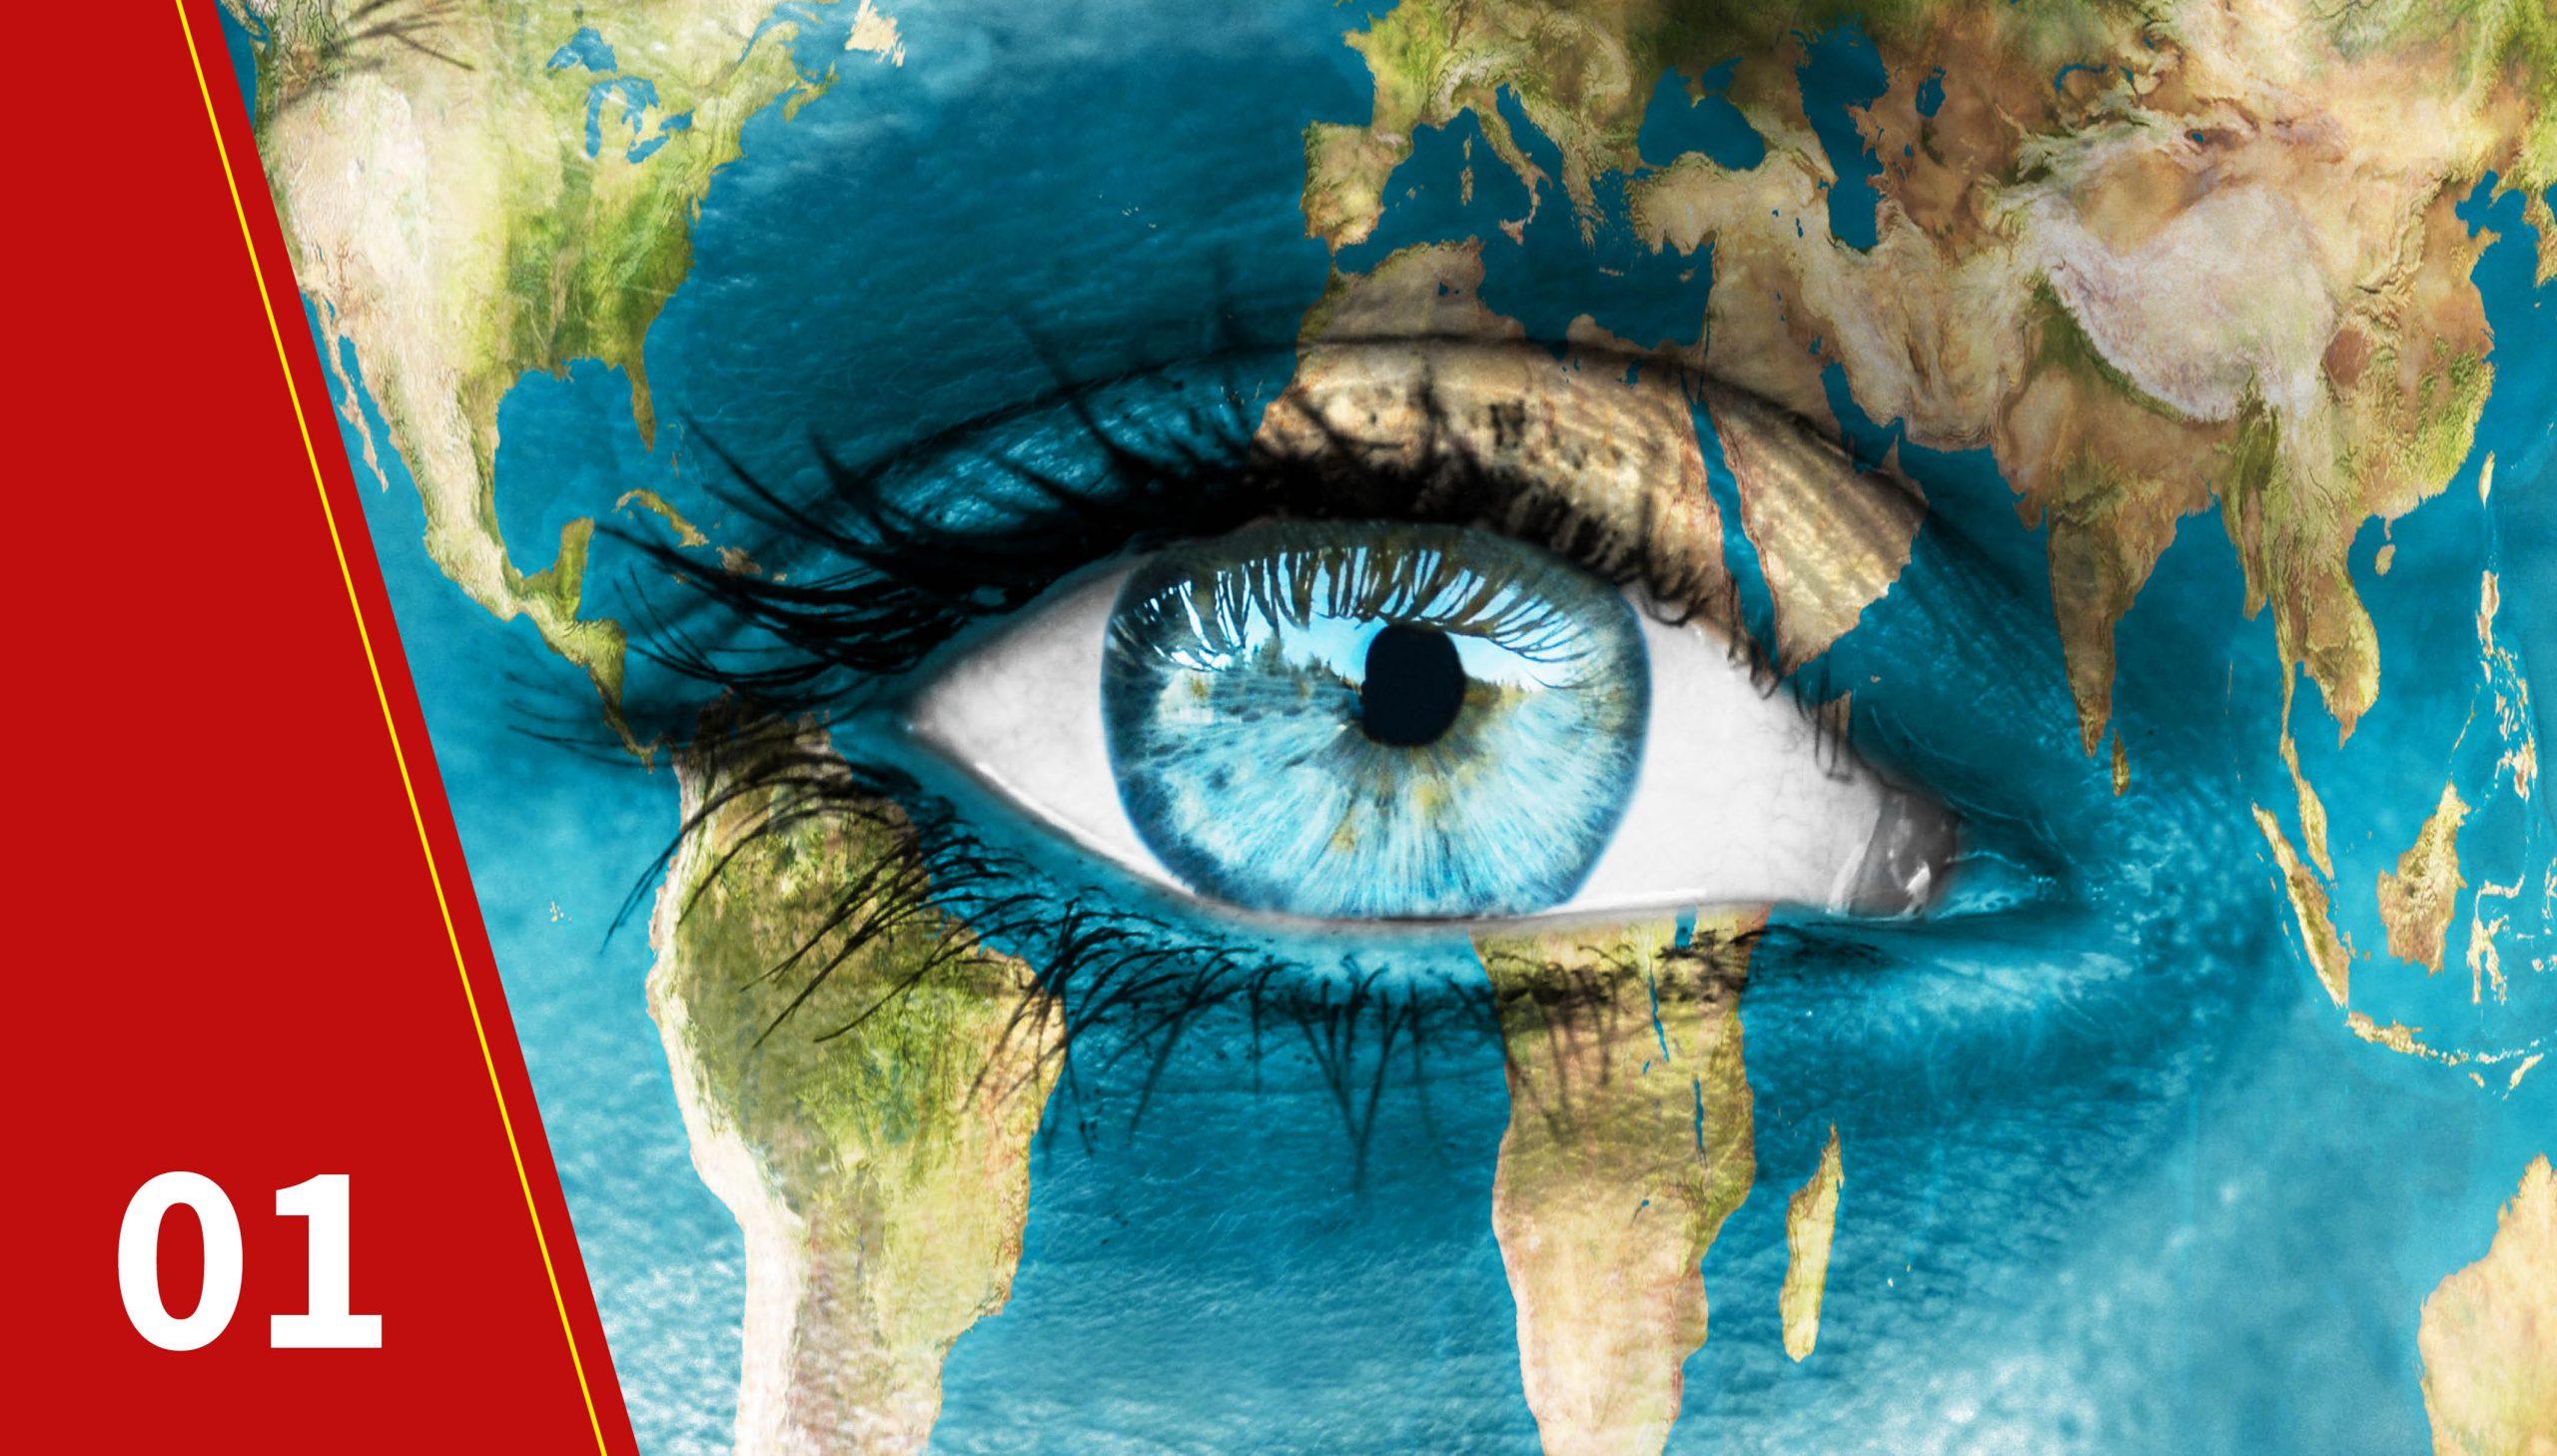 Belong to a global community